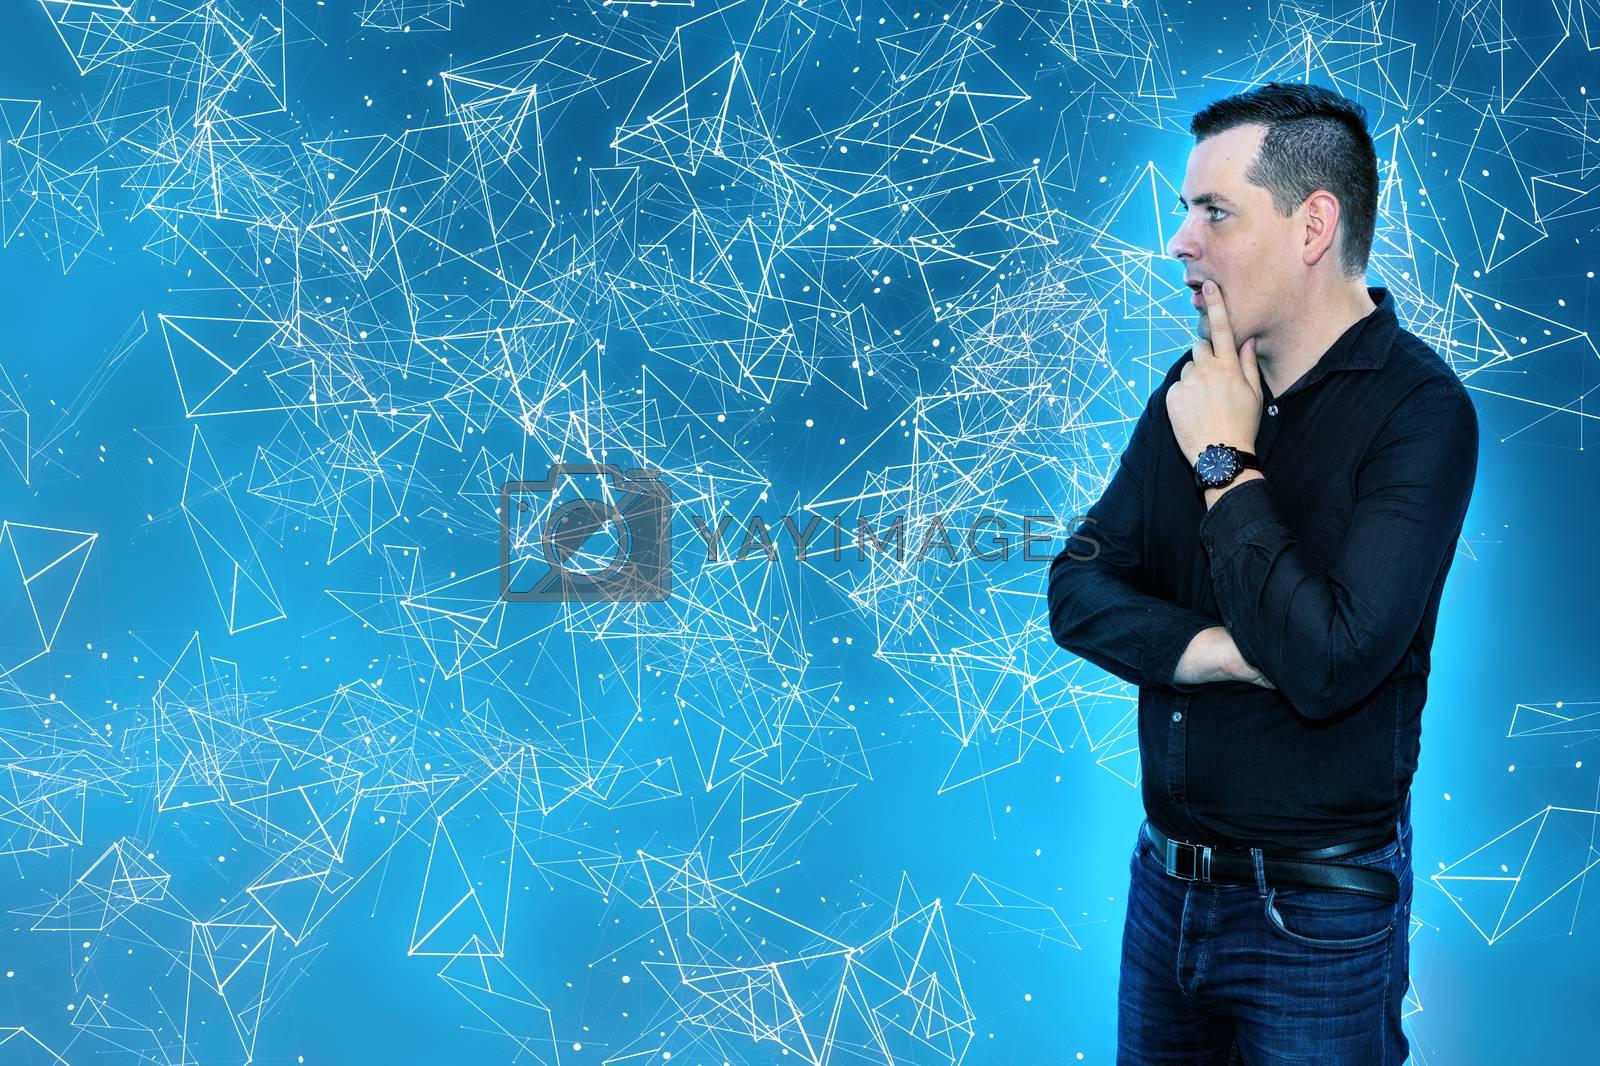 businessman against blue plexus background digital networking technology. lightning